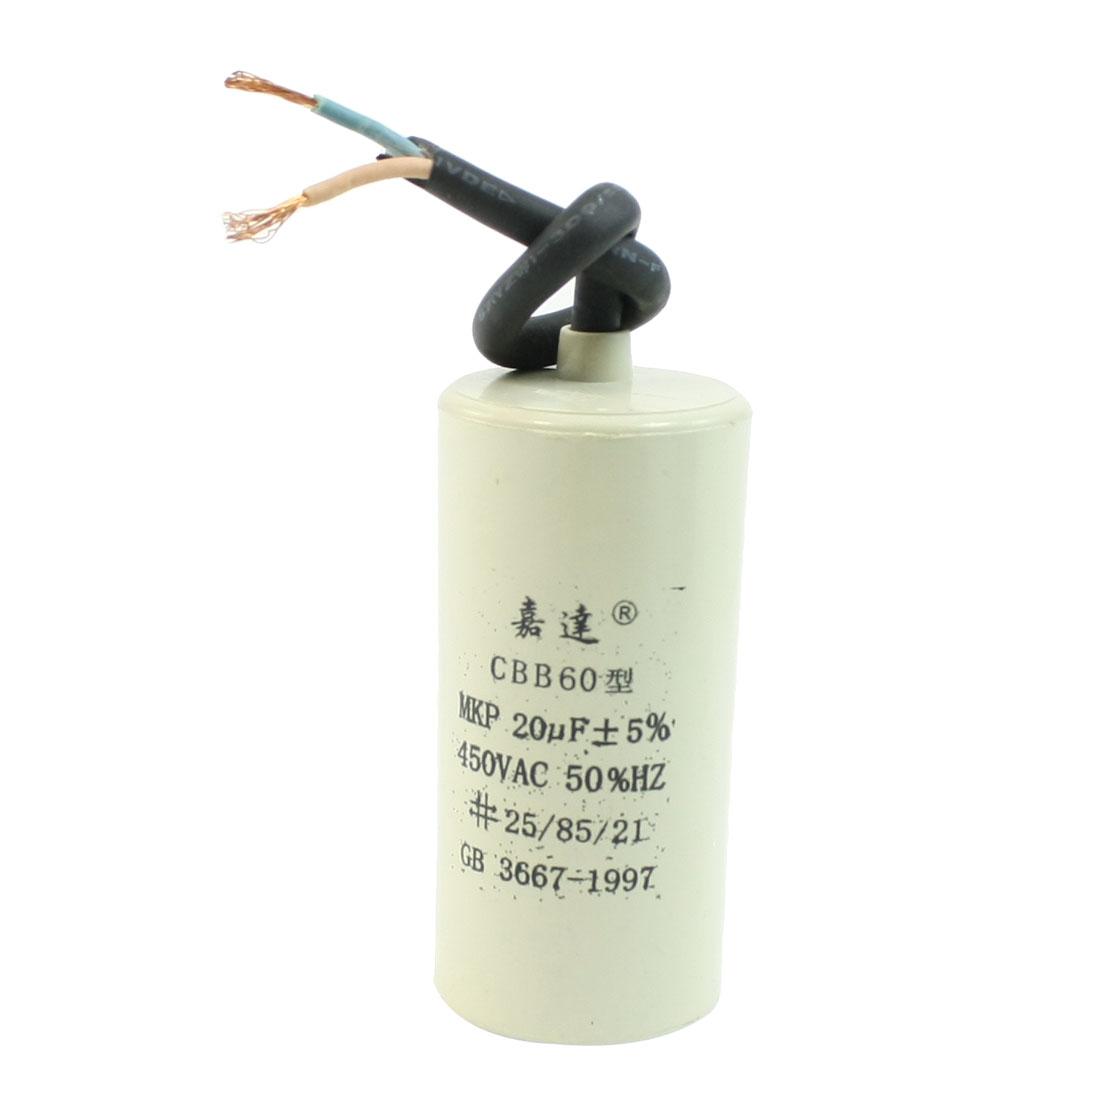 CBB60 AC 450V 20uF Cylindrical Non Polar Motor Capacitor for Washing Machine